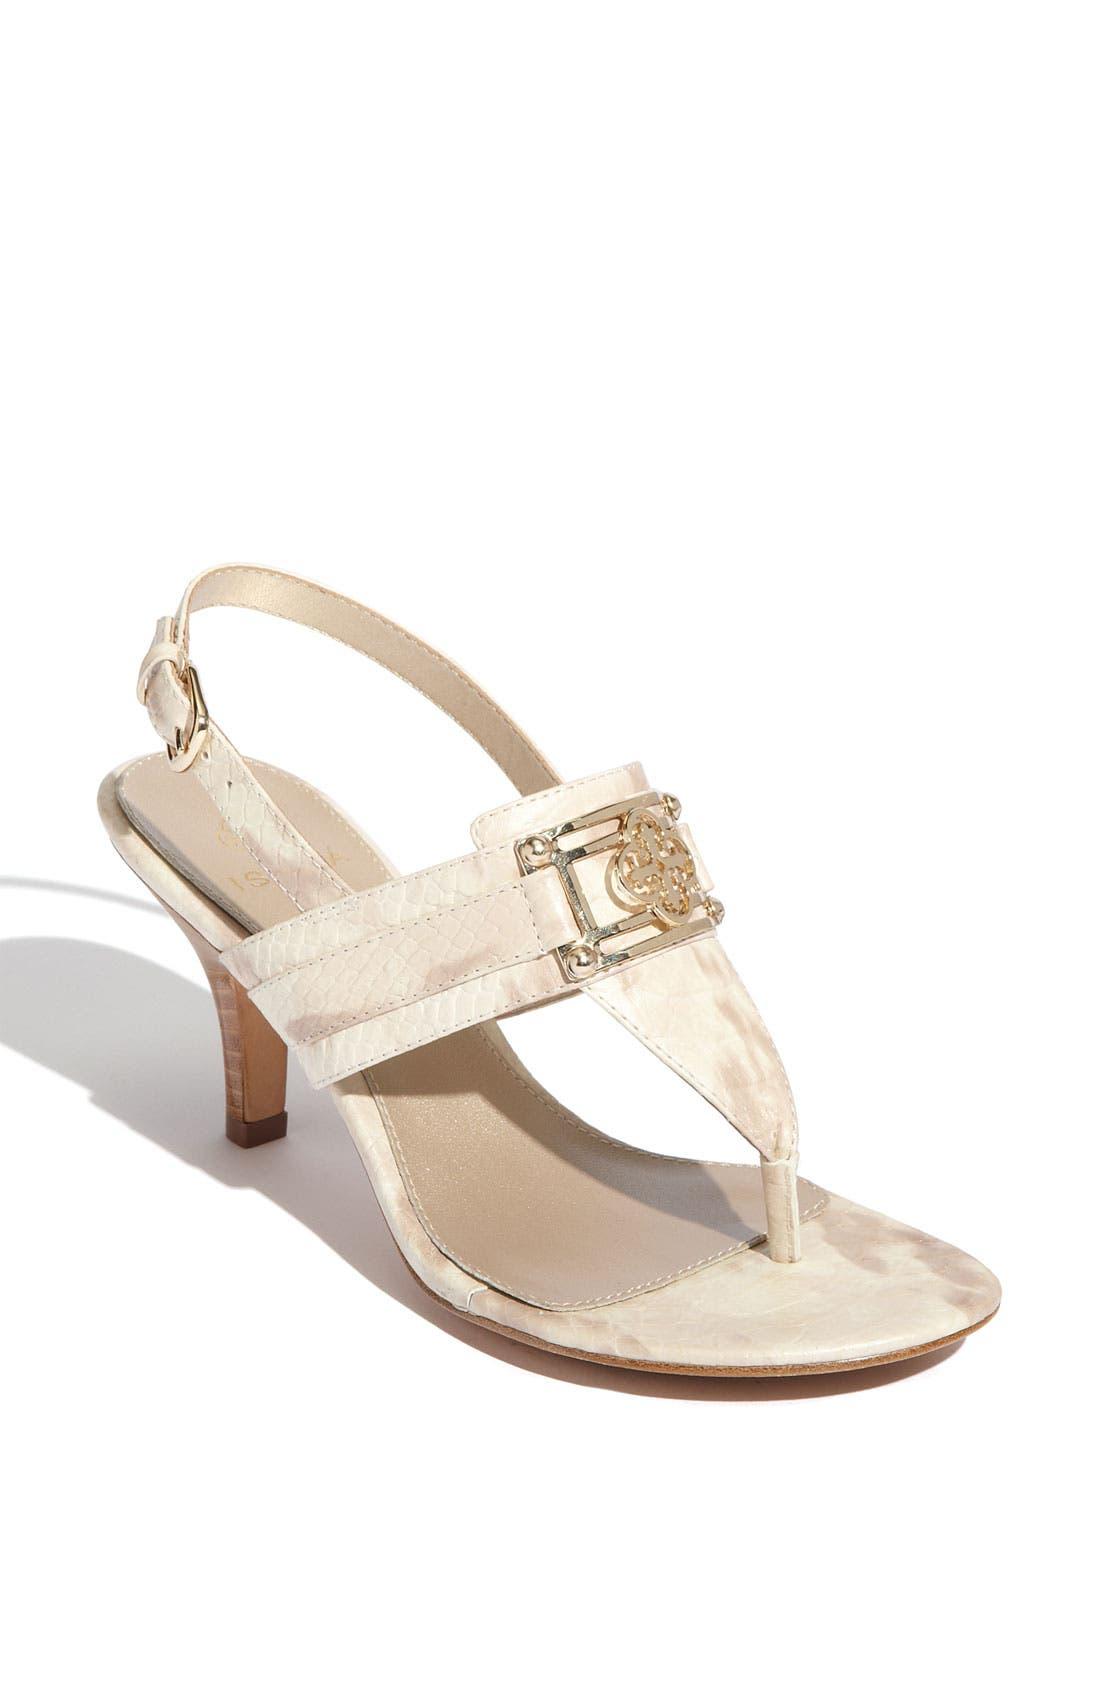 Main Image - Isolá 'Karma' Slingback Sandal